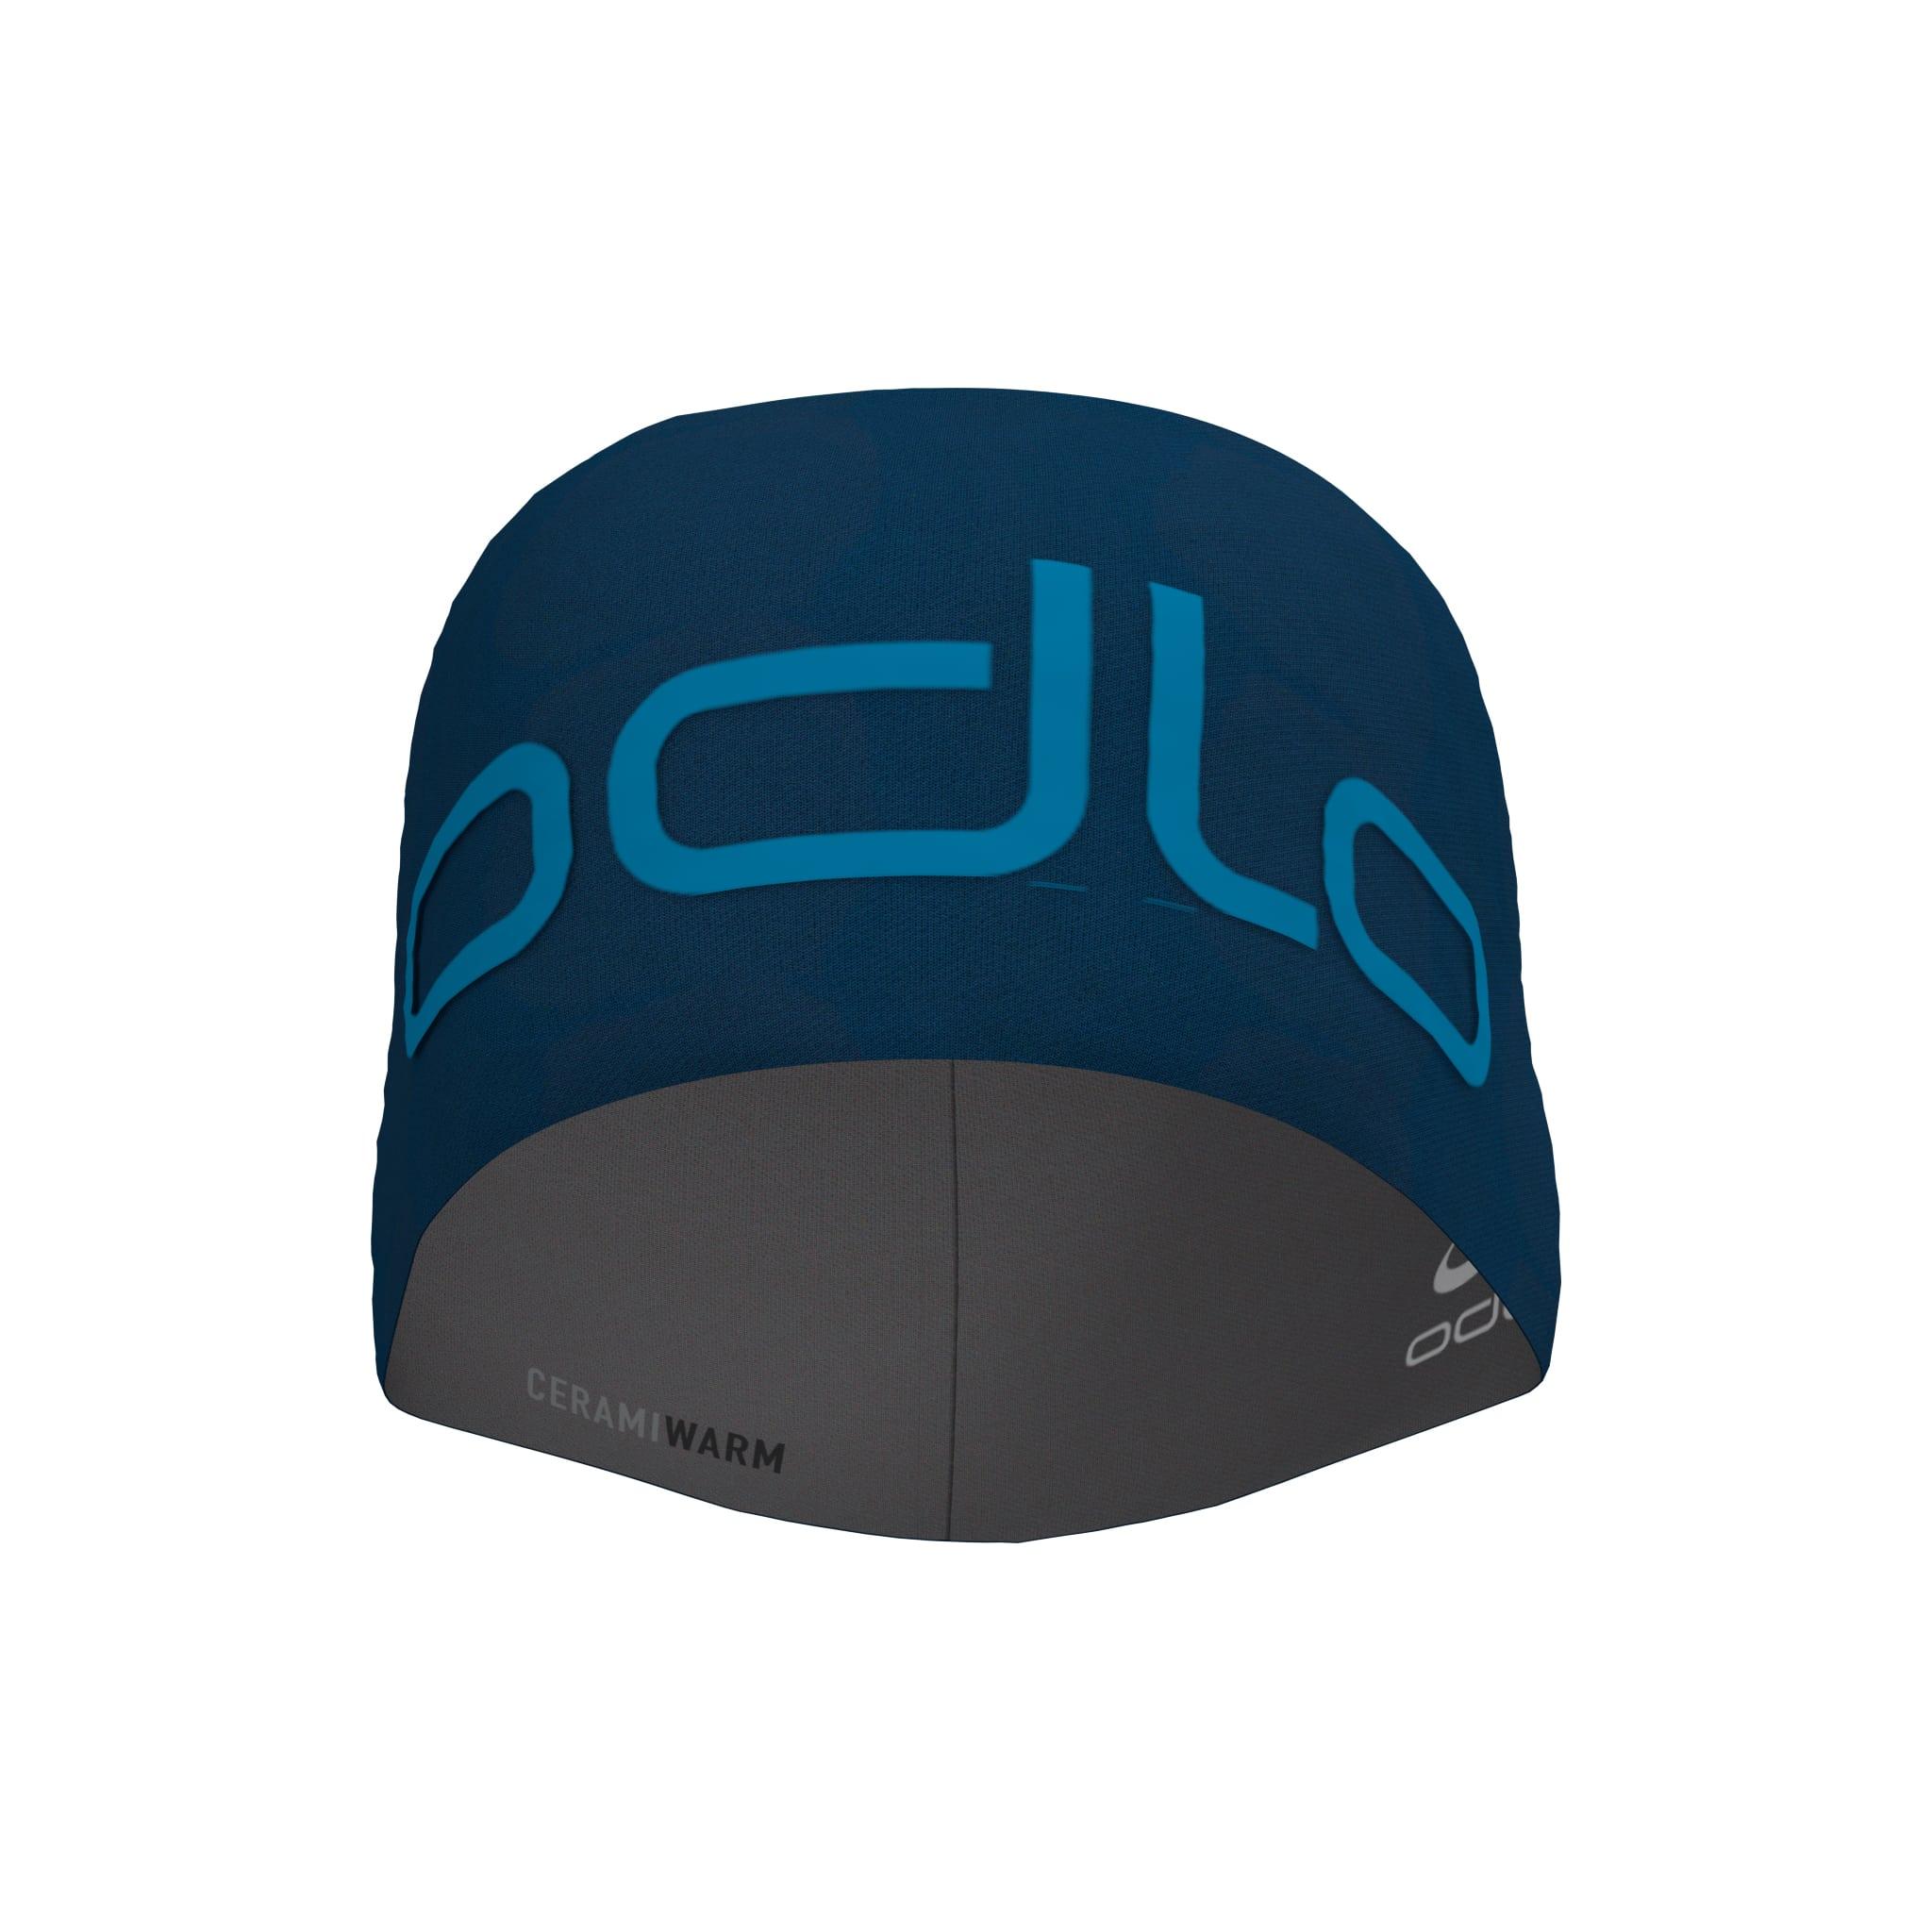 Ceramiwarm Revers Headband